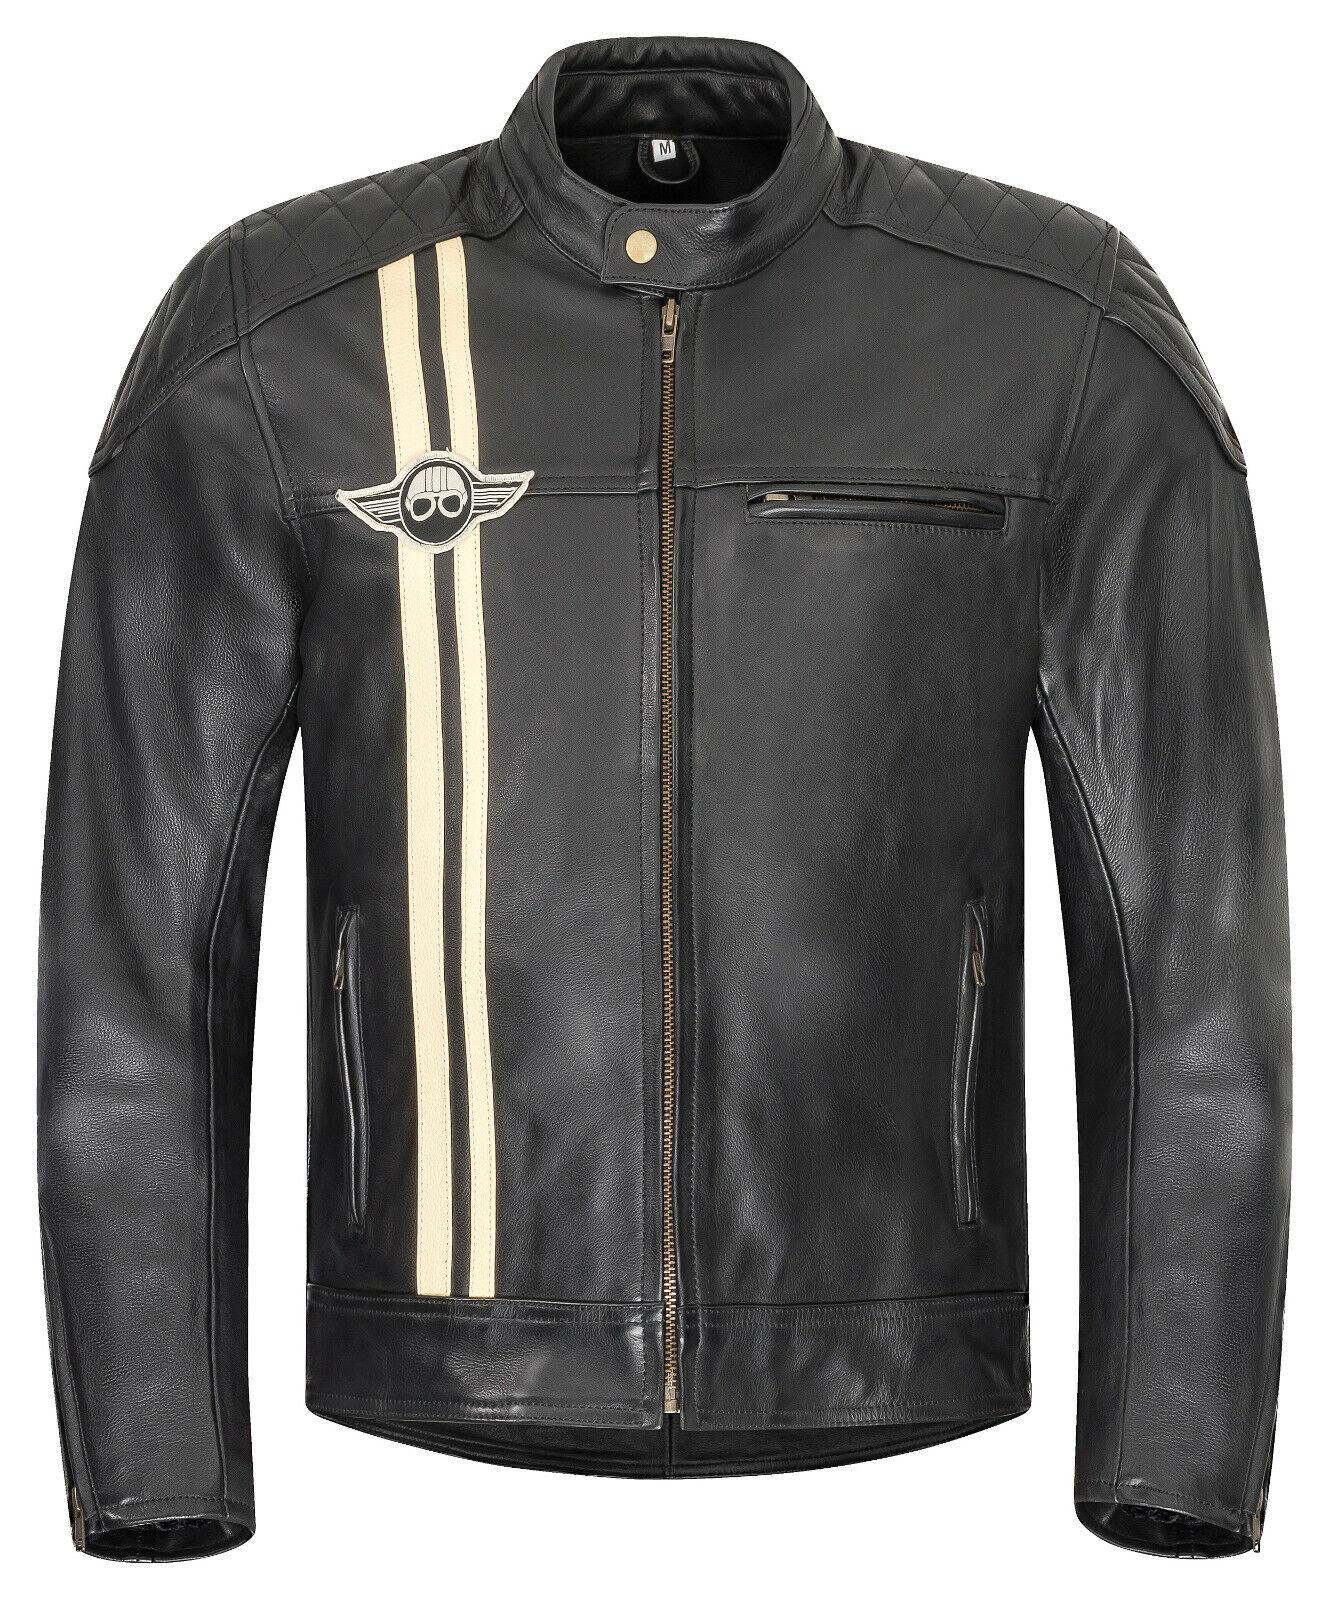 3XL XLS Motorradjacke Herren Klassik Motorrad Lederjacke Retro Bikerjacke Vintage Grau